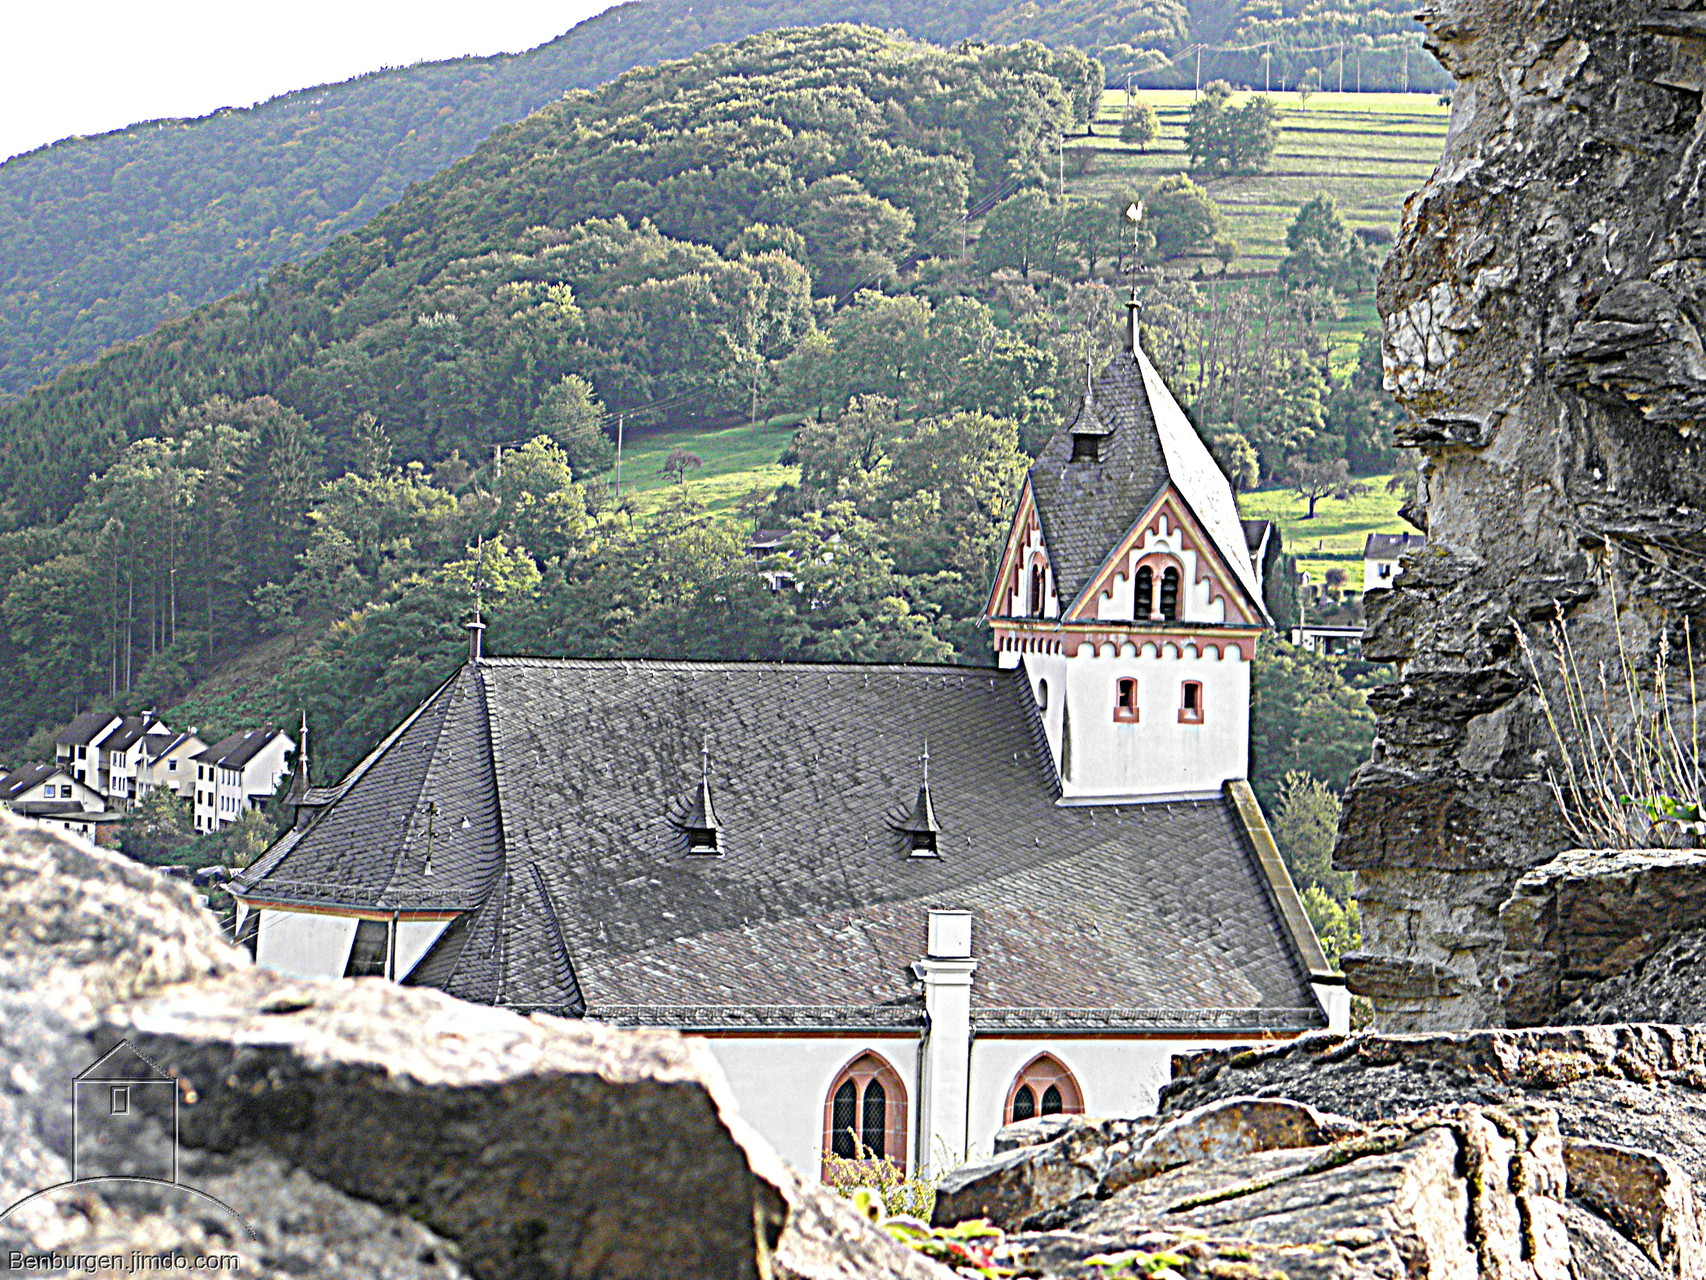 Pfarrkirche St. Kastor in  Dausenau.